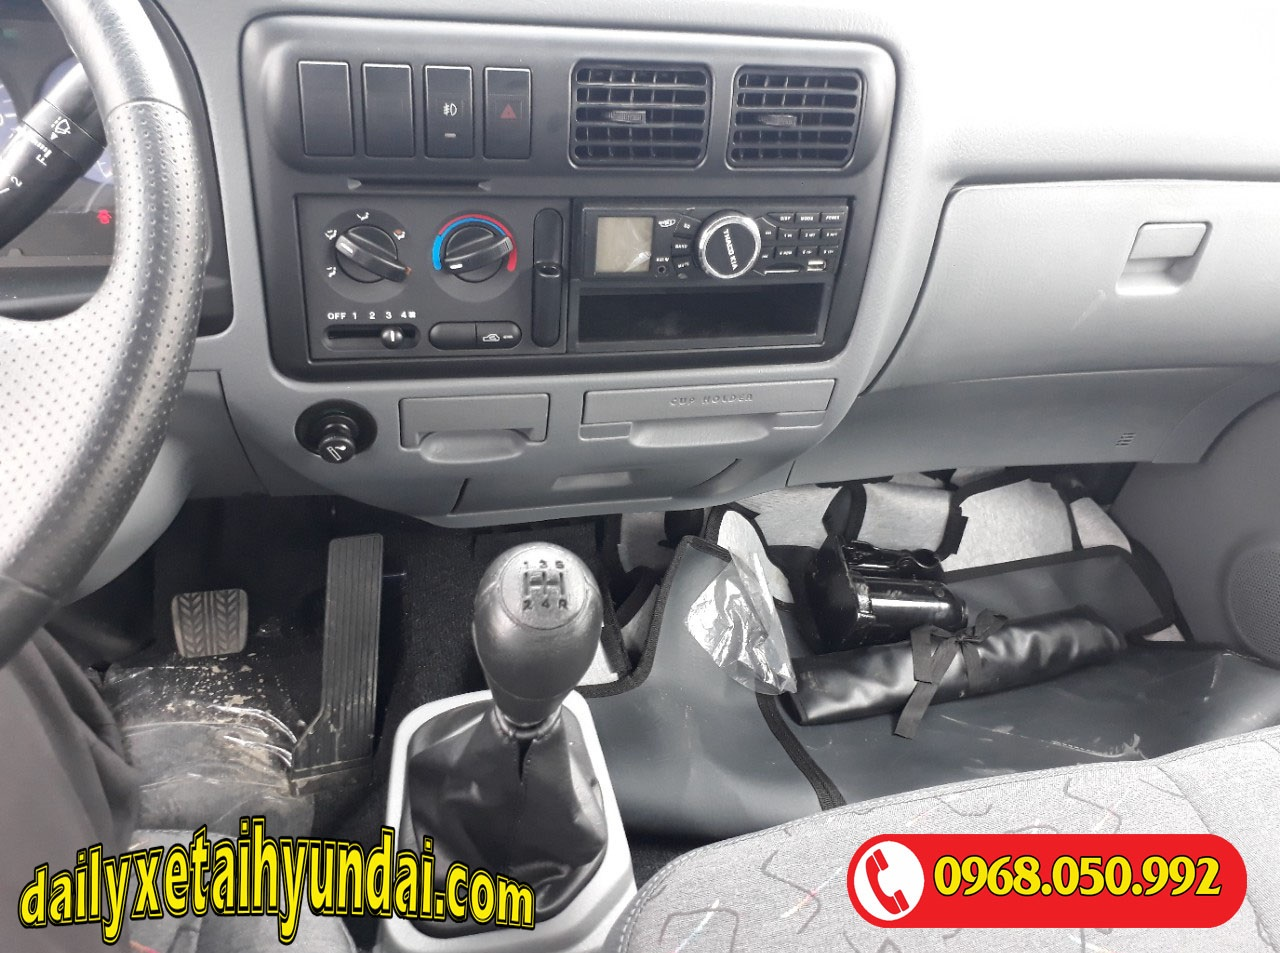 Nội thất xe tải Kia